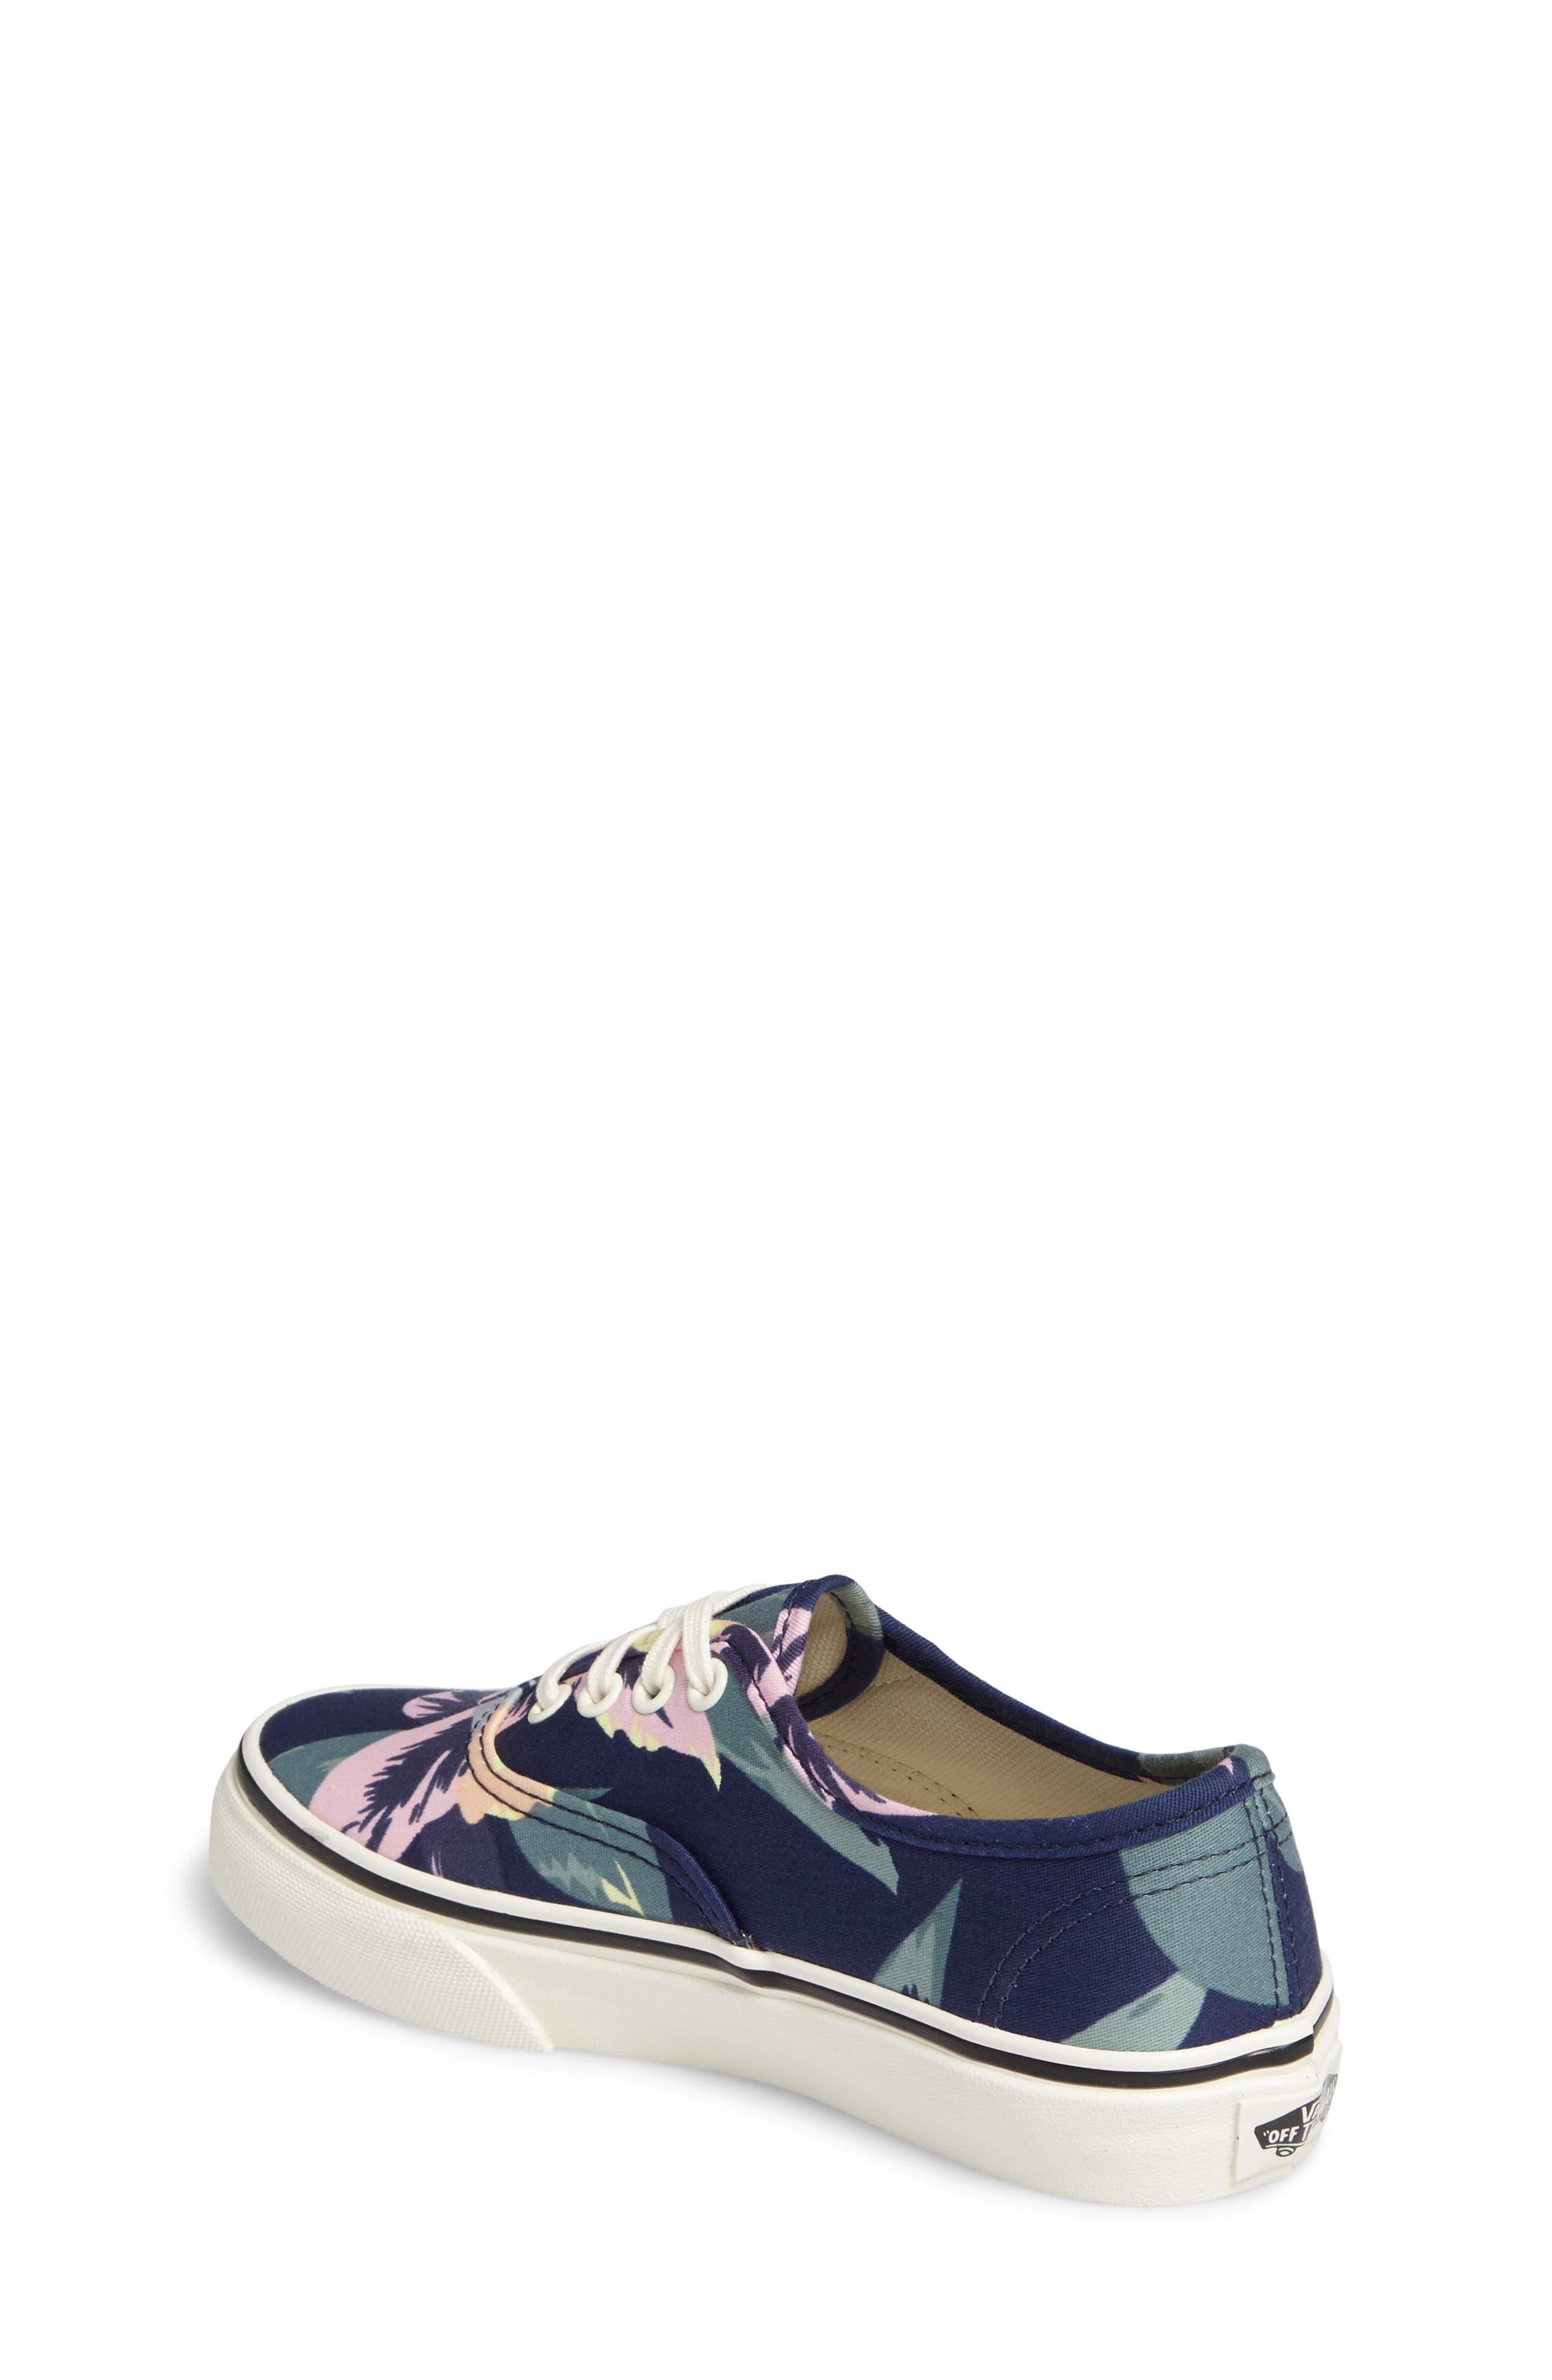 Alternate Image 2  - Vans Authentic Floral Print Sneaker (Toddler, Little Kid & Big Kid)